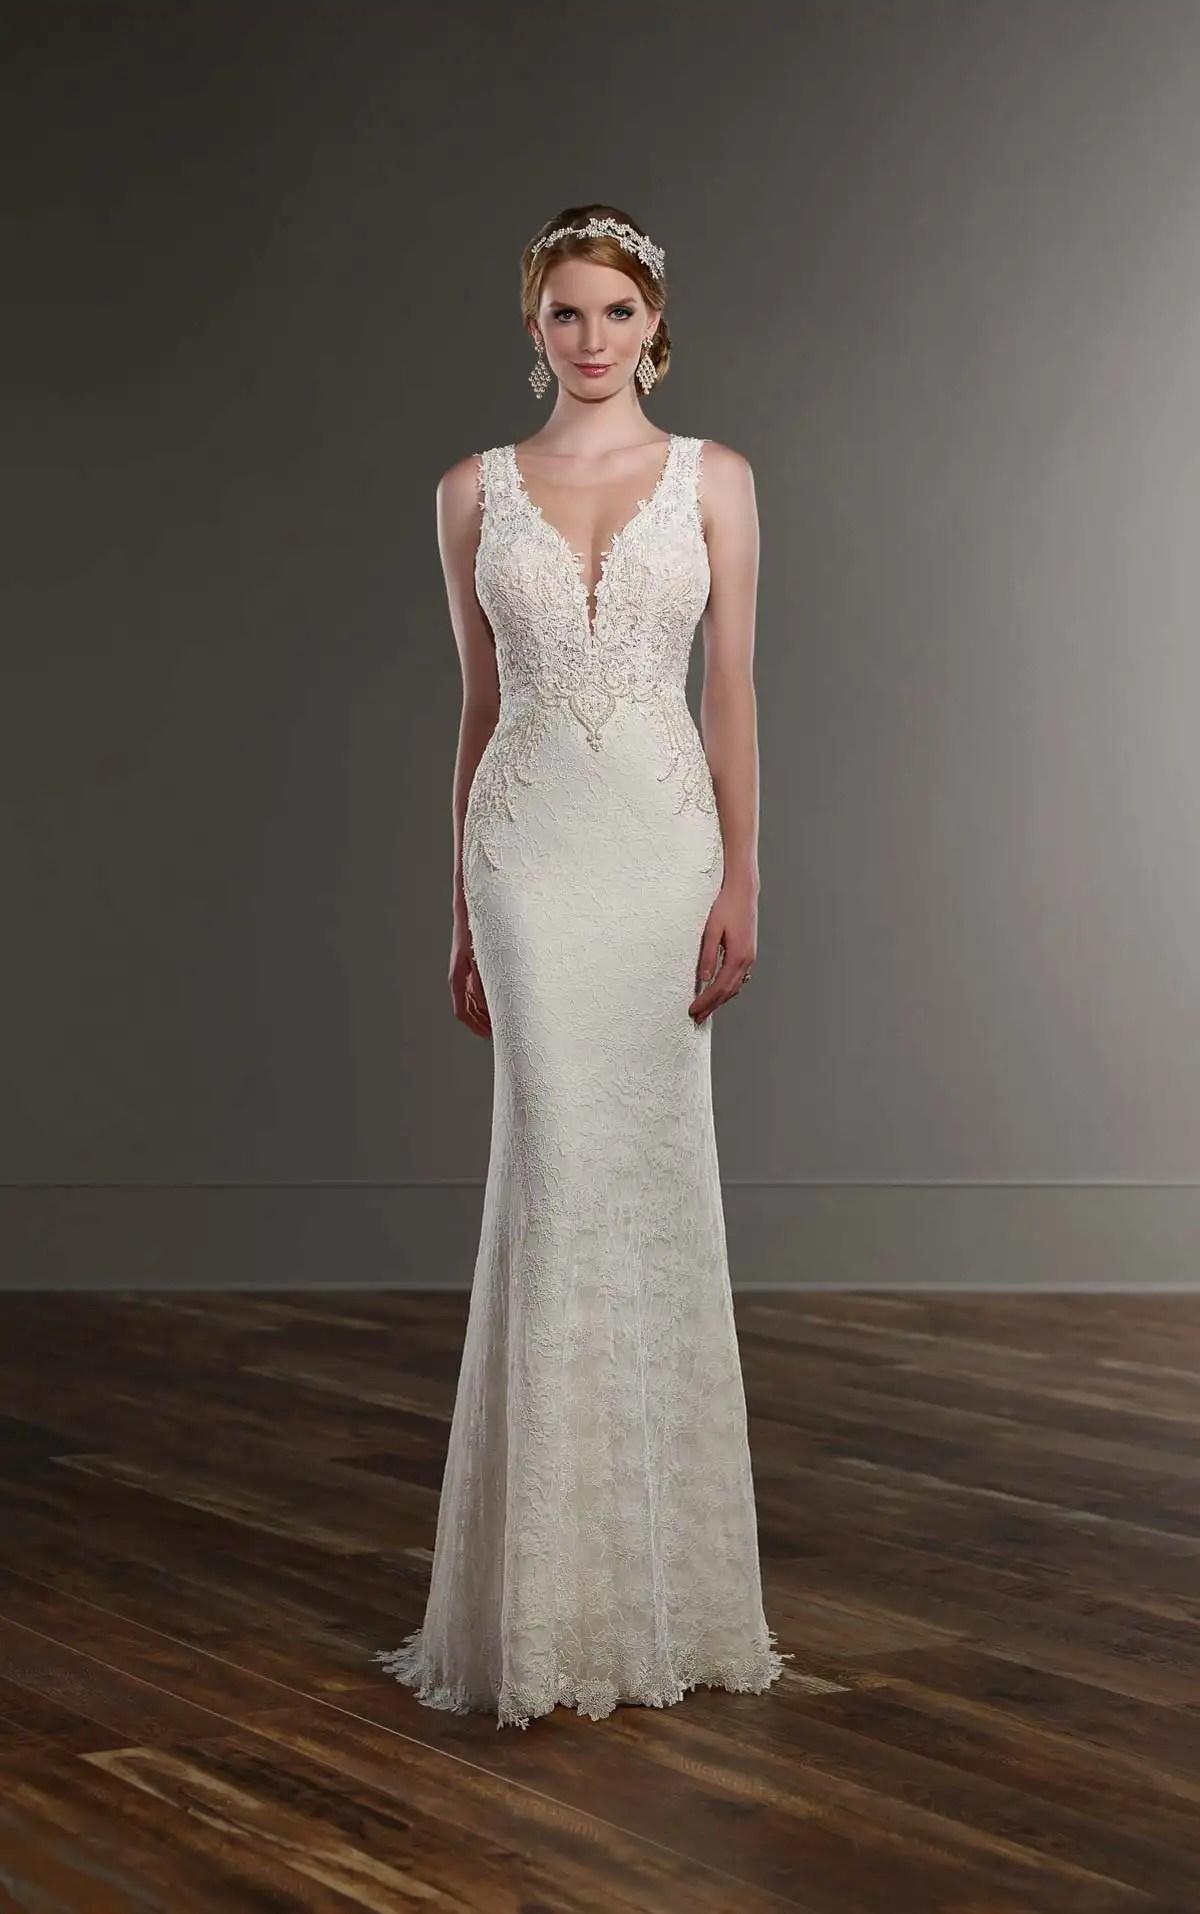 Sleek Wedding Gown Martina Liana Wedding Dresses